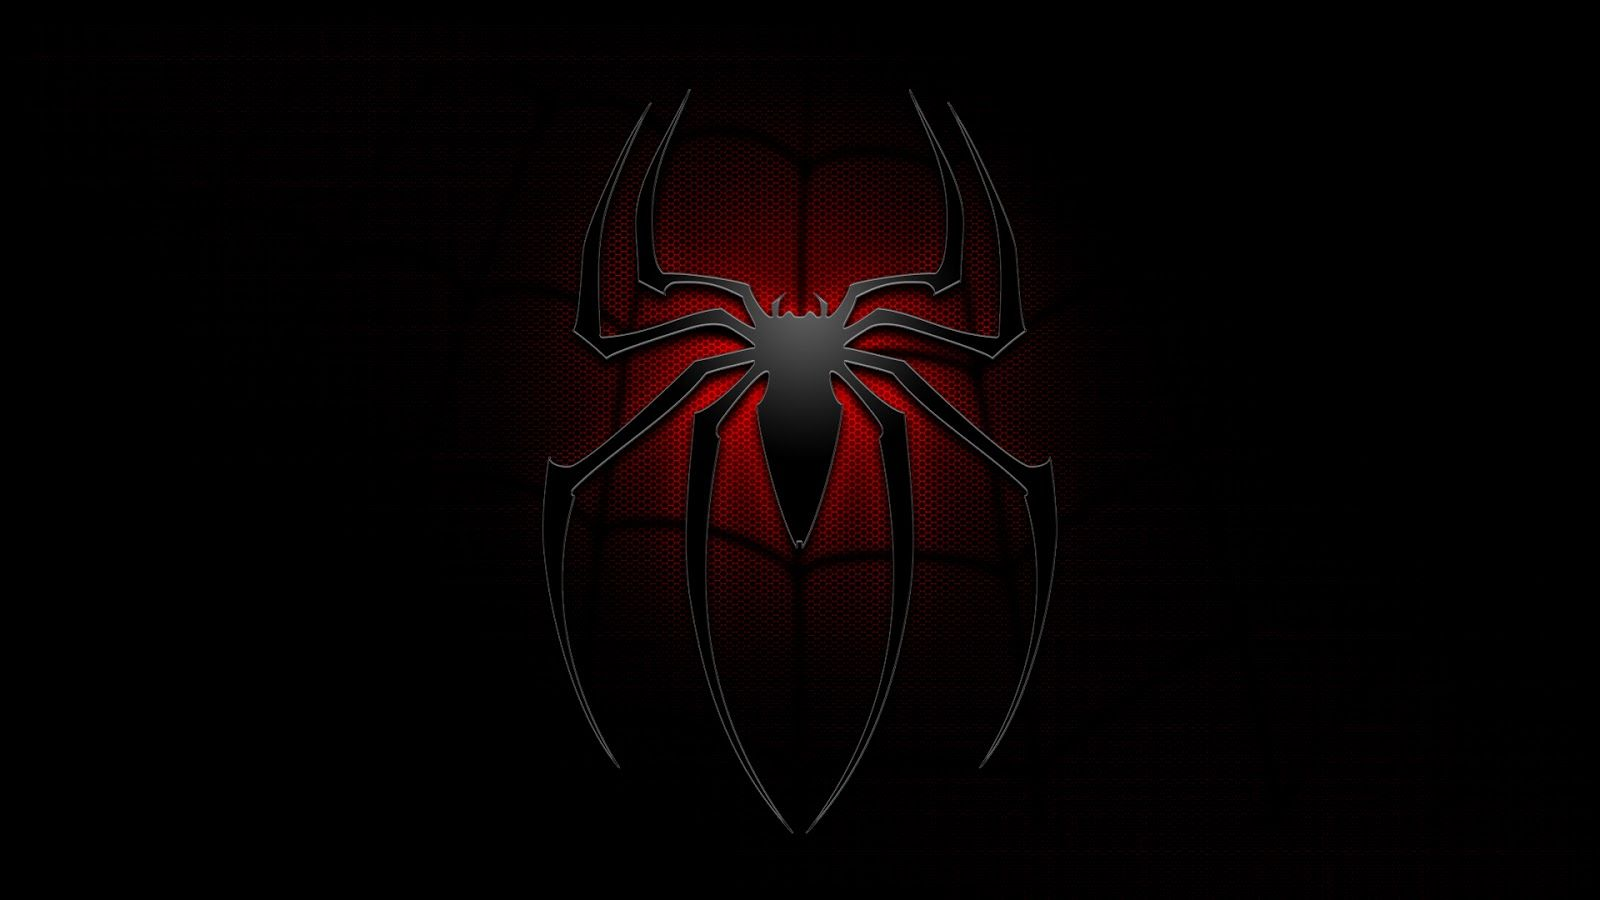 Amazing Spider Man Logo Hd Images Free Download 1920 1080 Amazing Spiderman Hd Wallpapers 36 Wallpapers Ador Spiderman Pictures Spiderman Images Spiderman